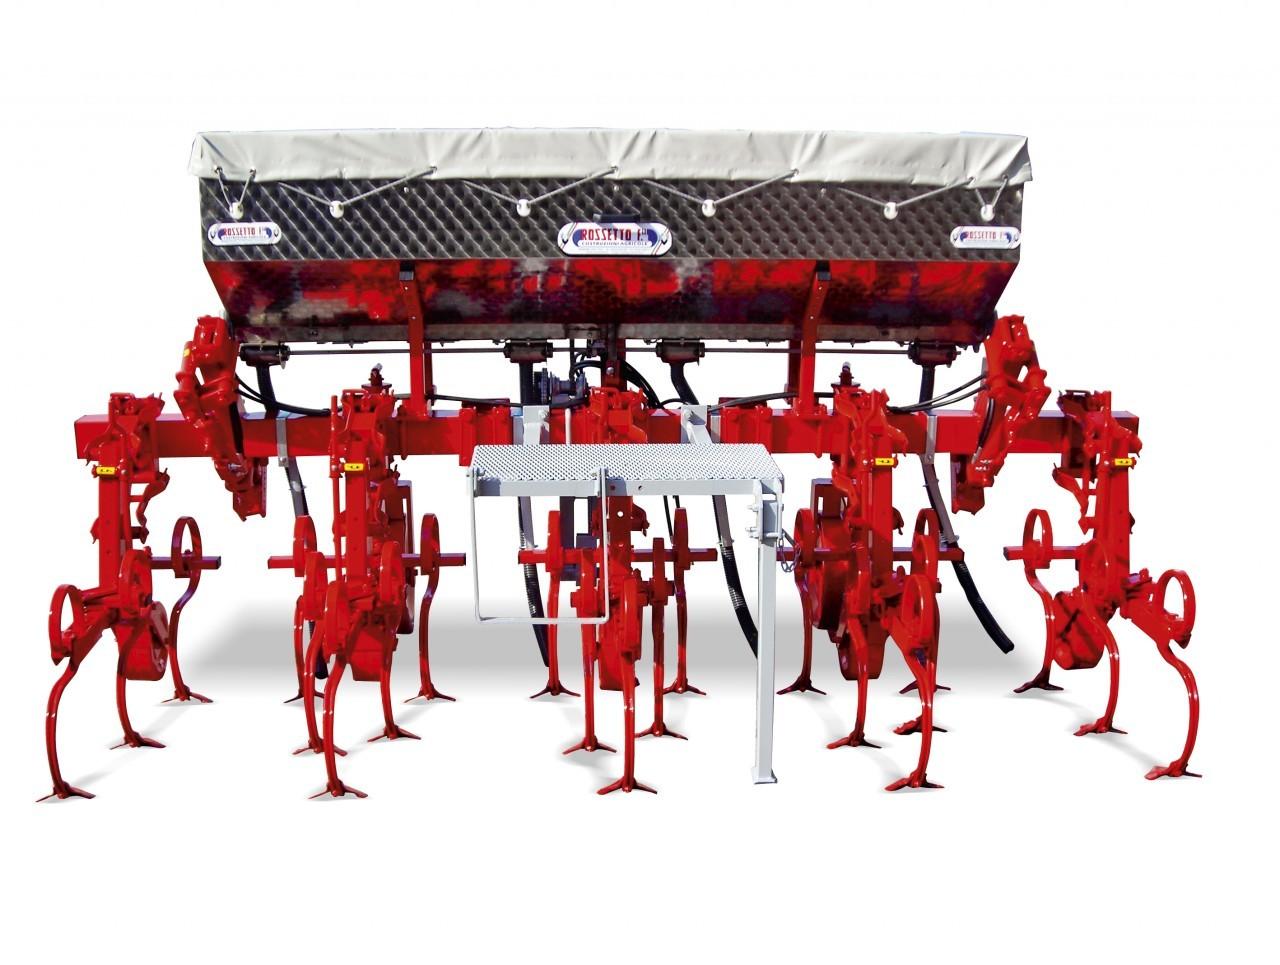 SV 4 rows weeder with inox spreader-manure